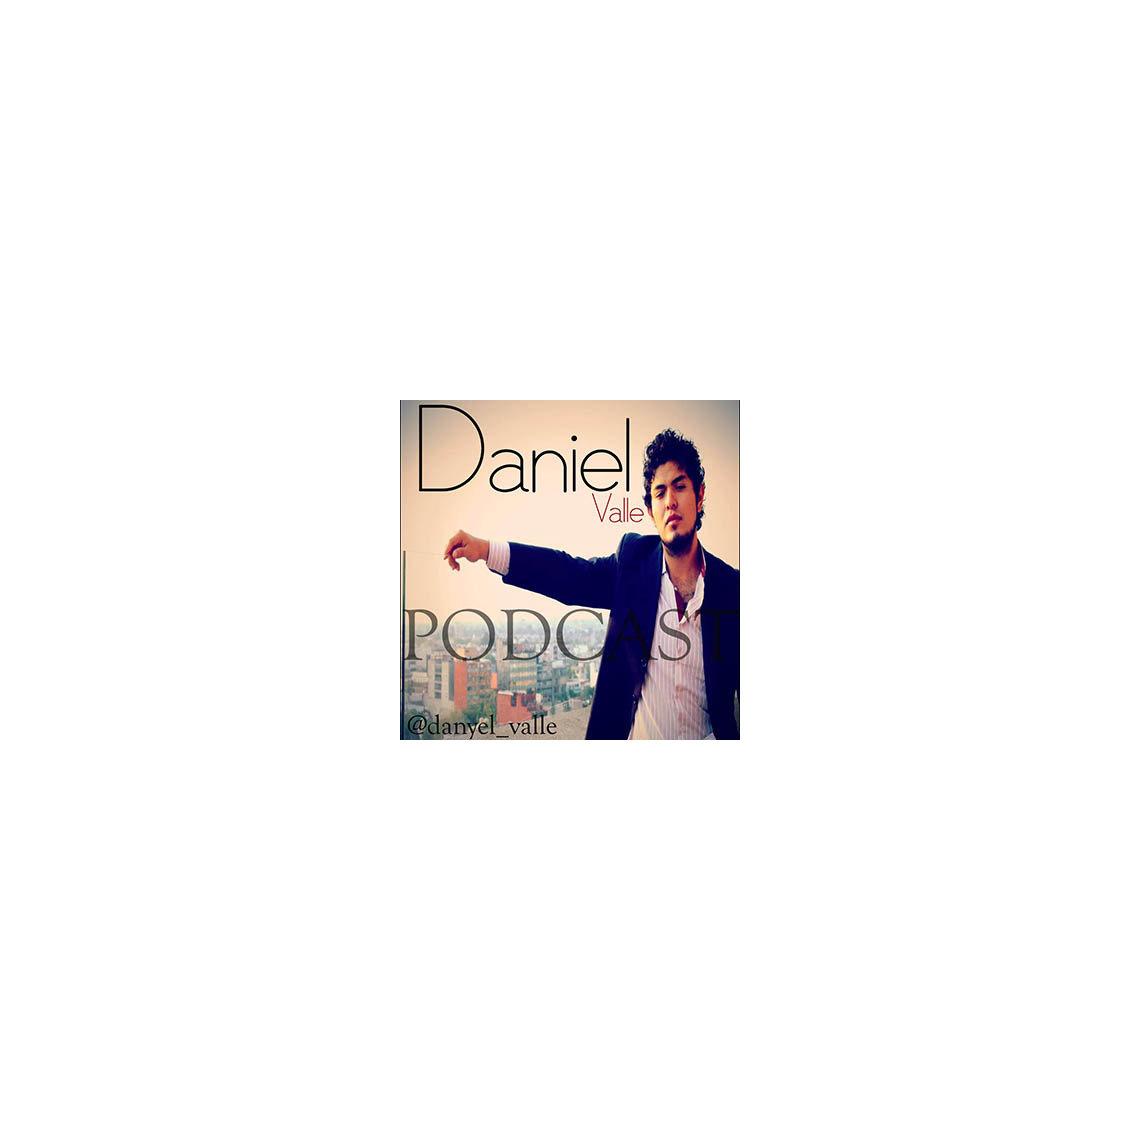 <![CDATA[Podcast de Daniel Valle]]>